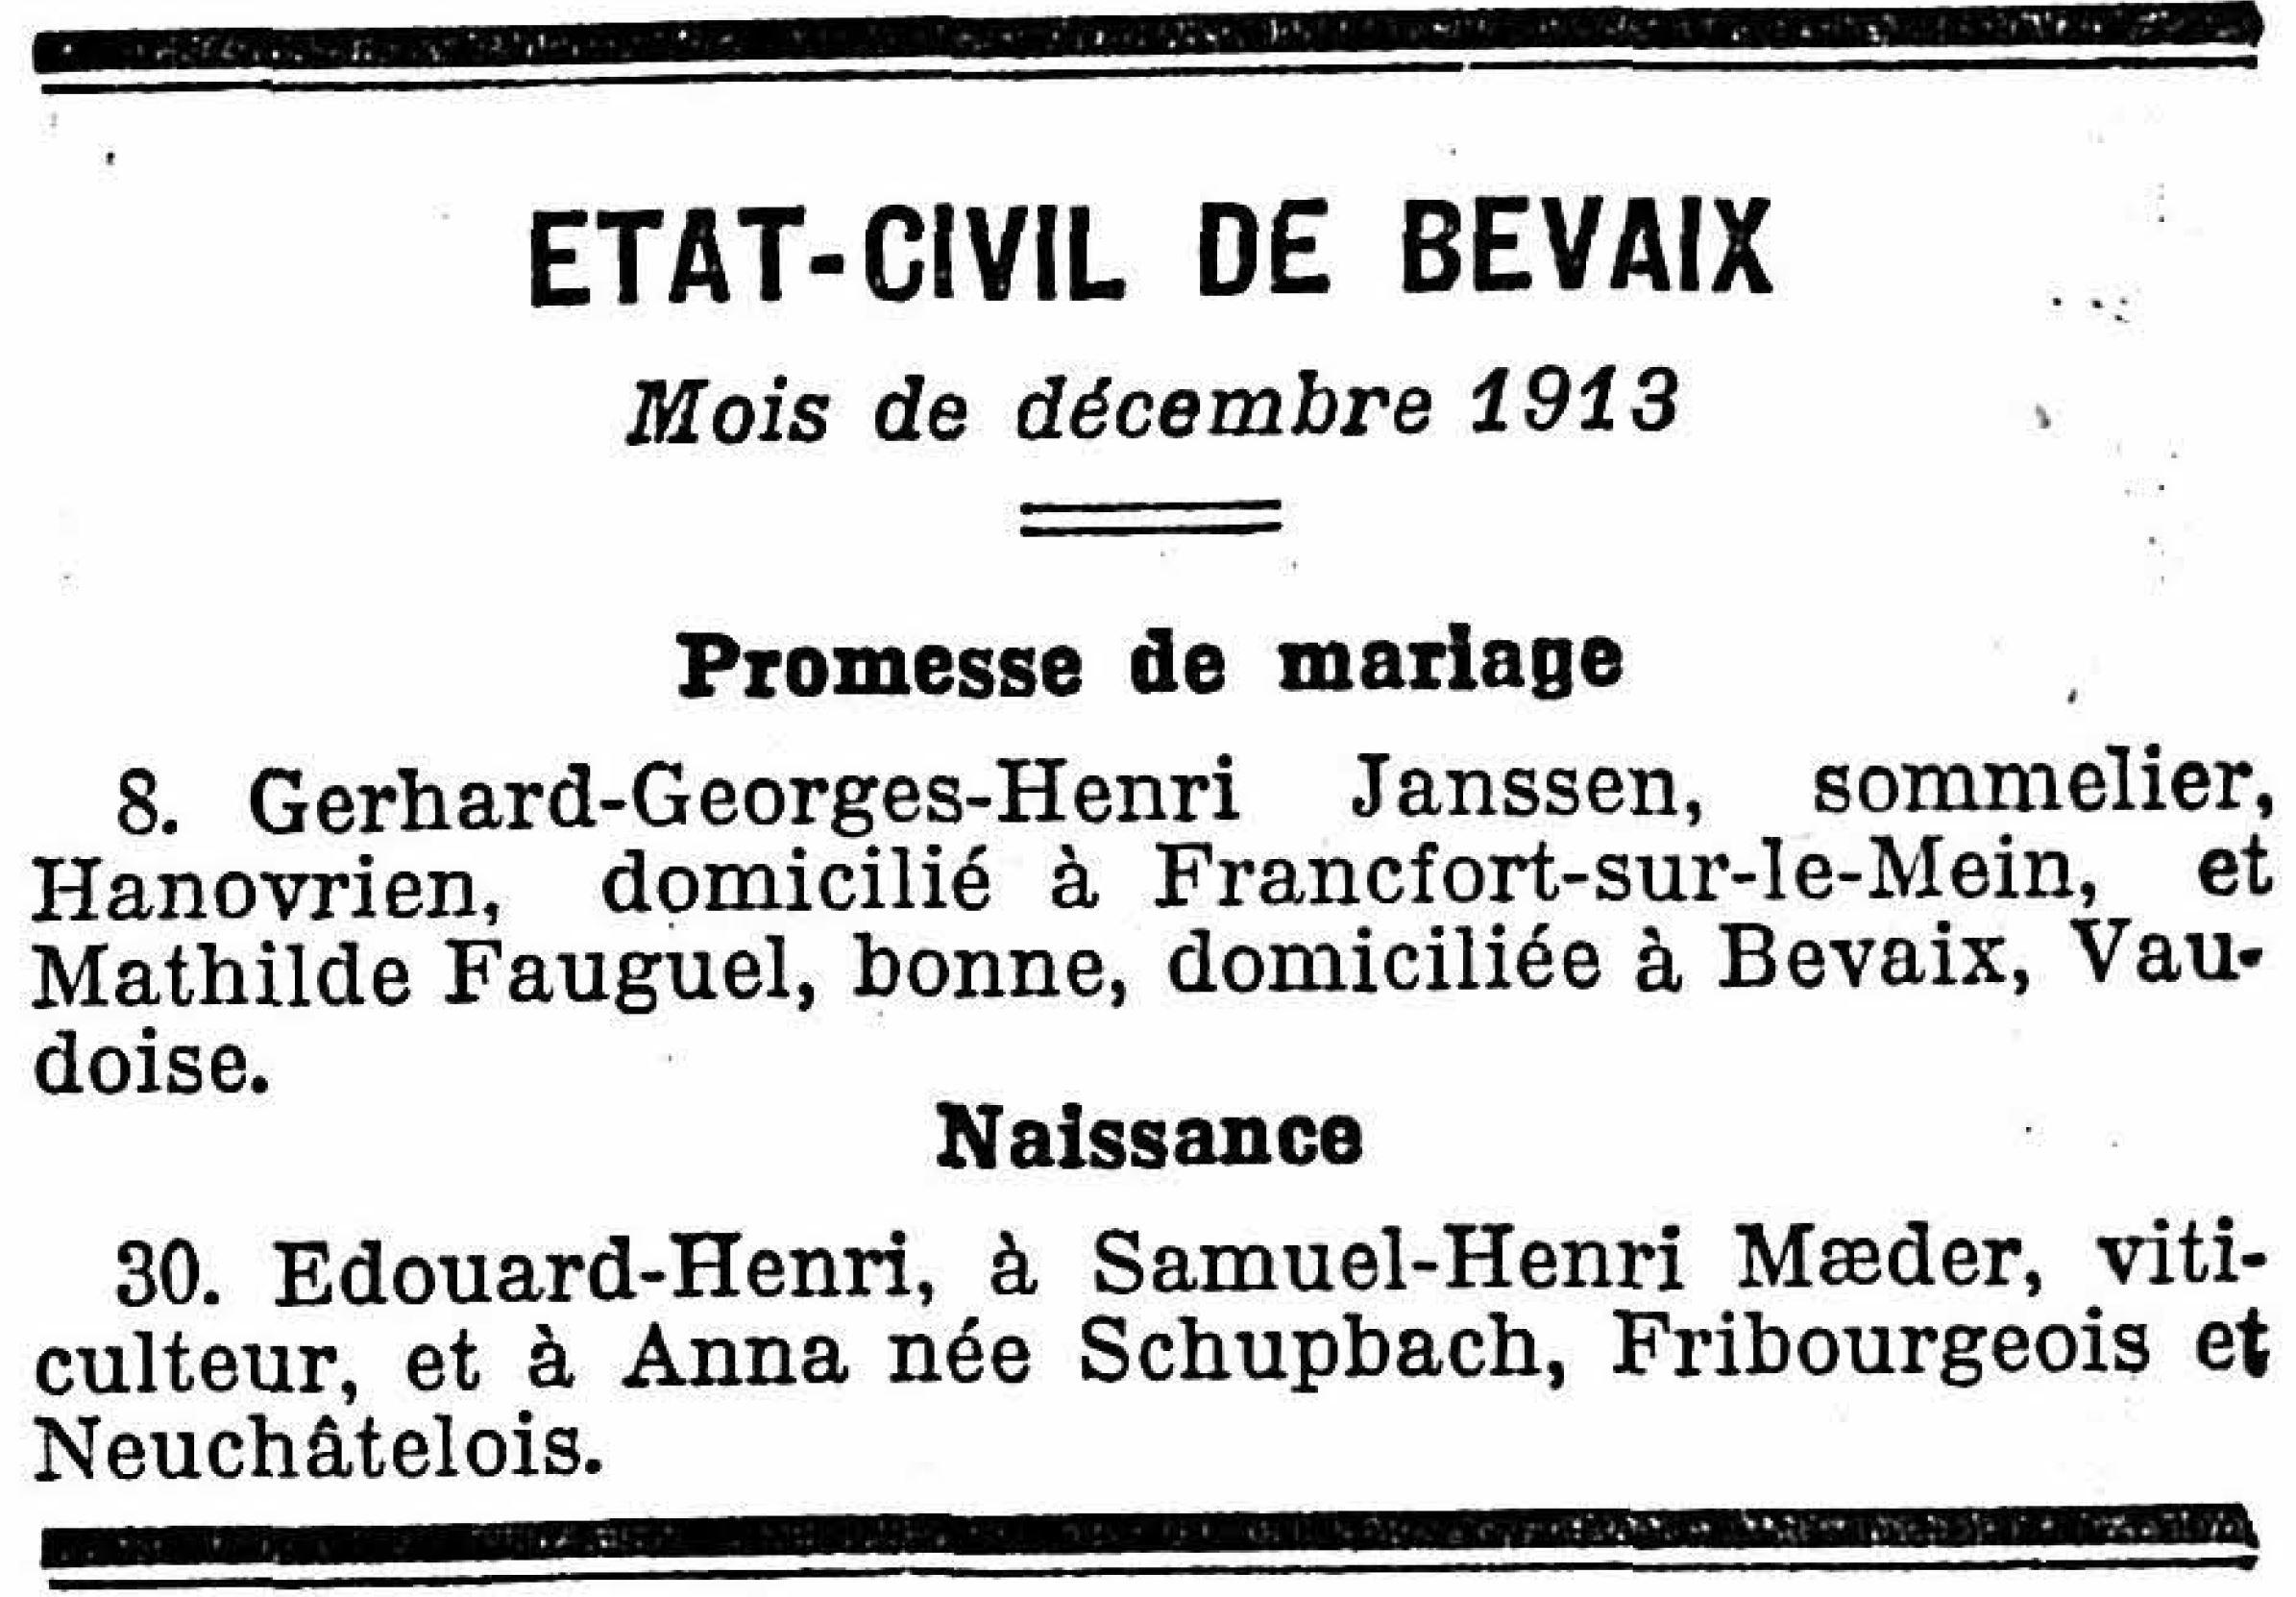 Edouard Henri Maeder